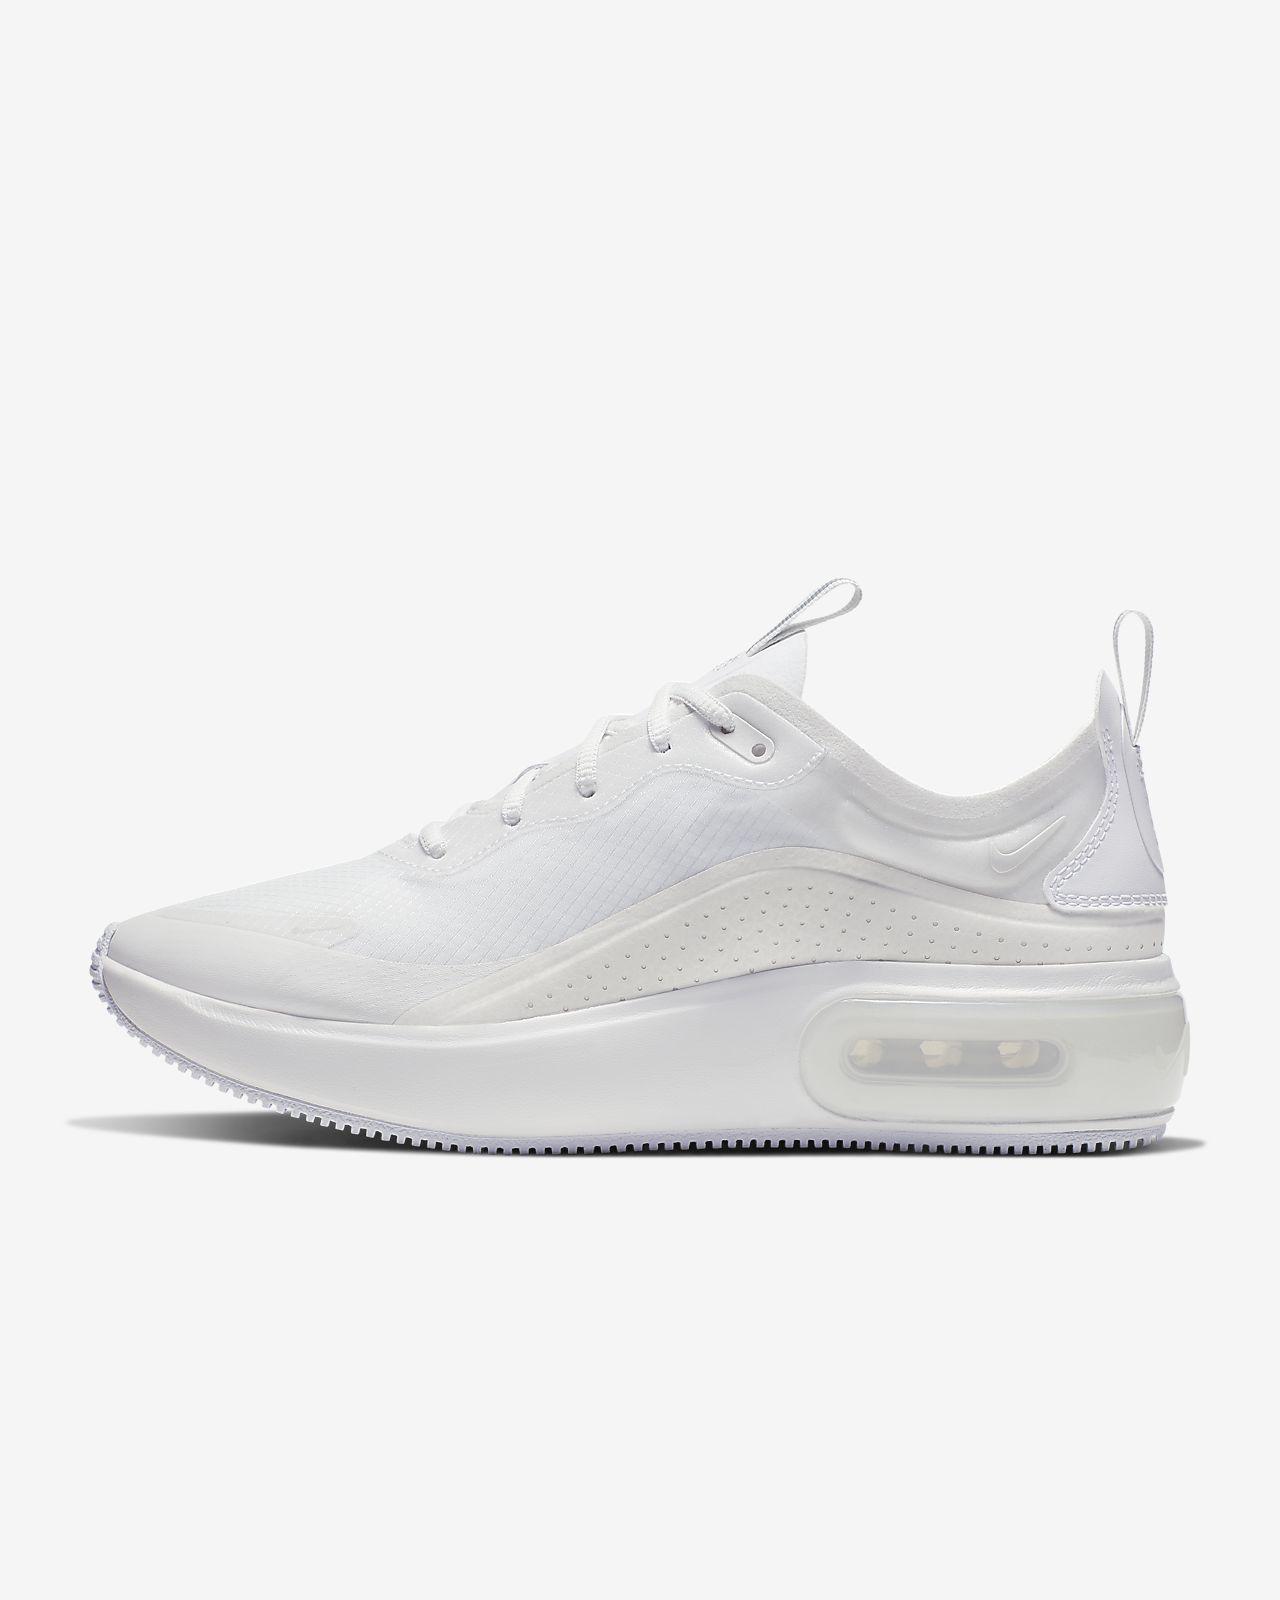 Nike Air Max Dia SE Schoen